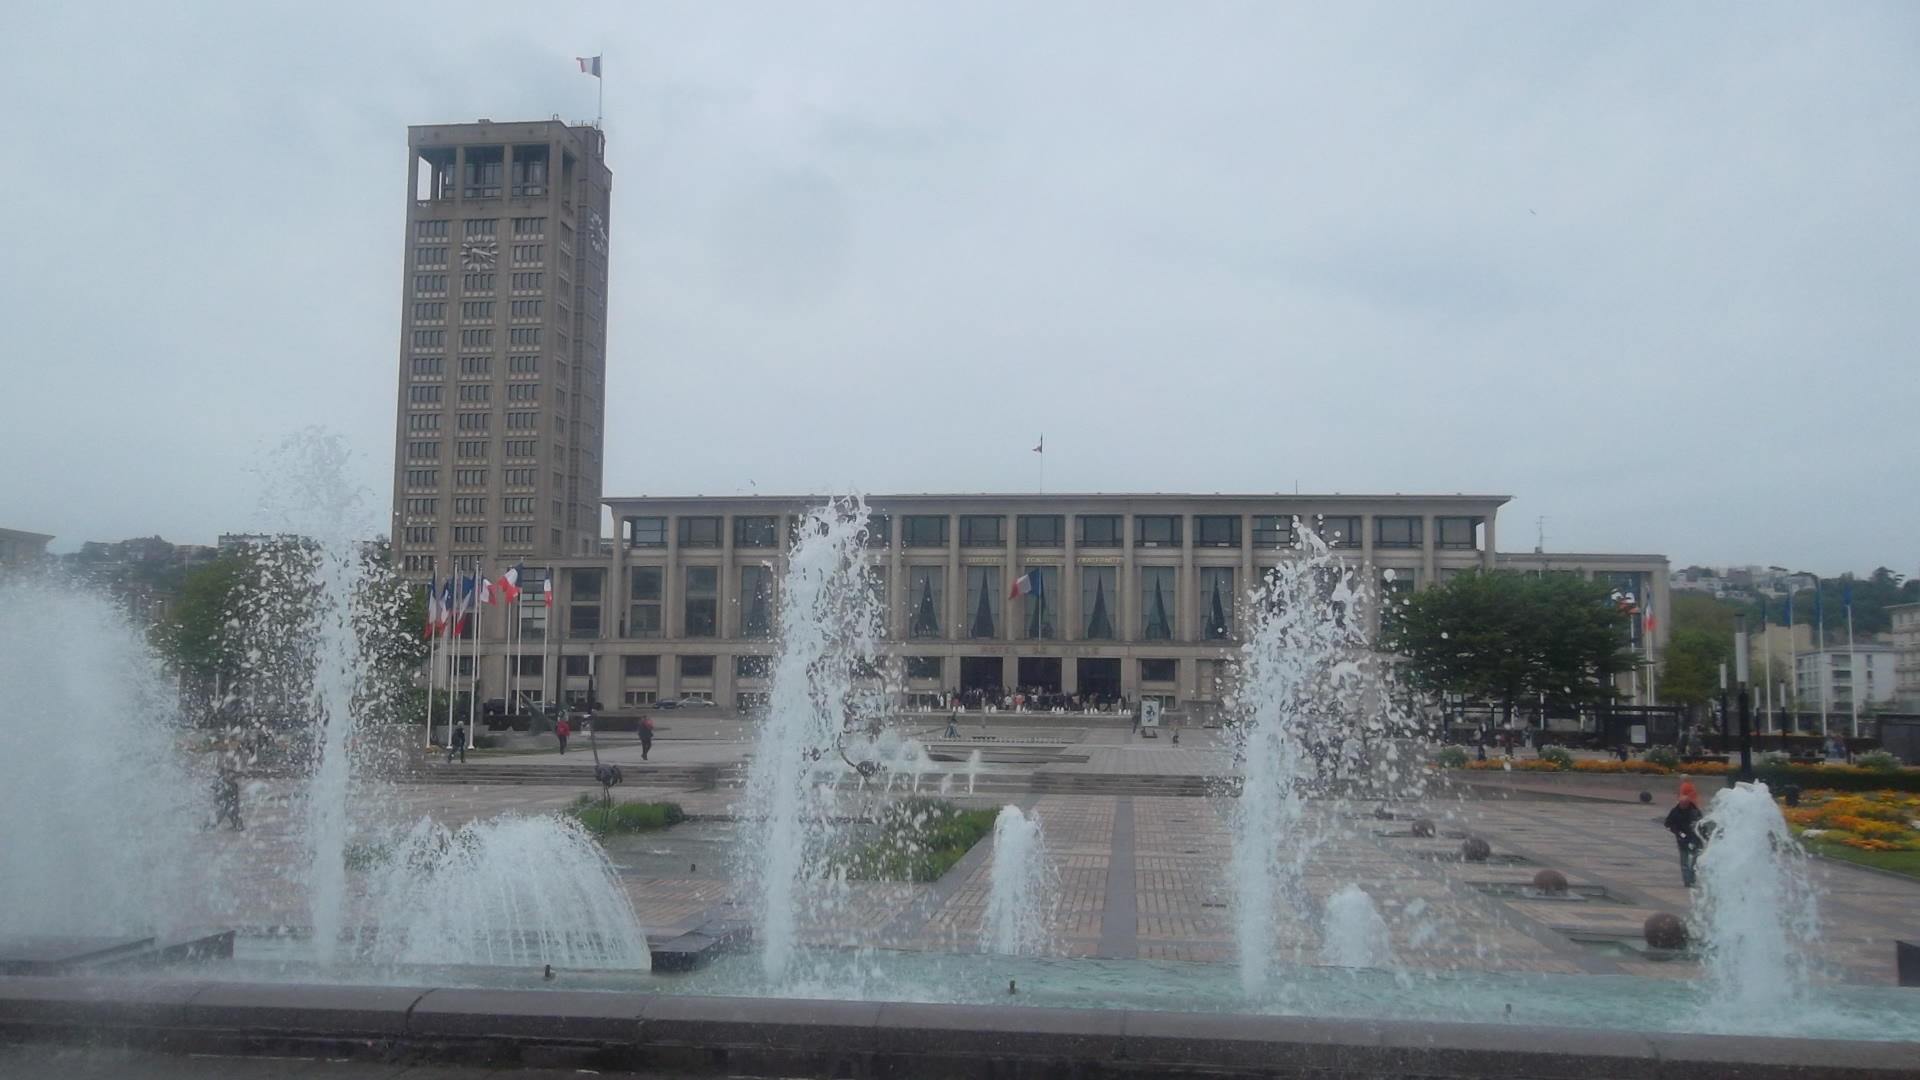 le-havre-hotel-de-ville-my13